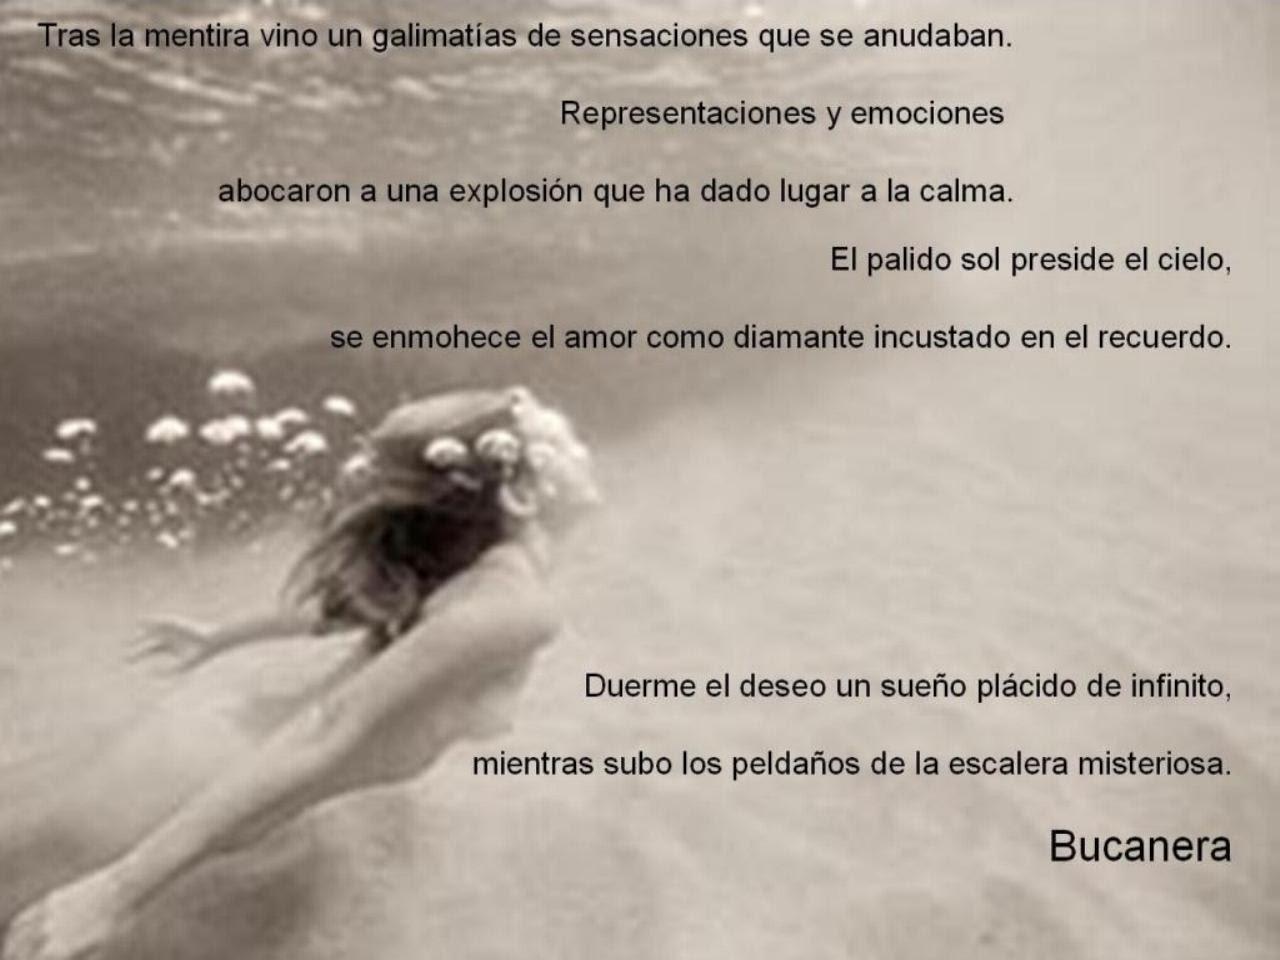 http://anaan.files.wordpress.com/2011/10/bucanera-054-tras-la-mentira.jpg